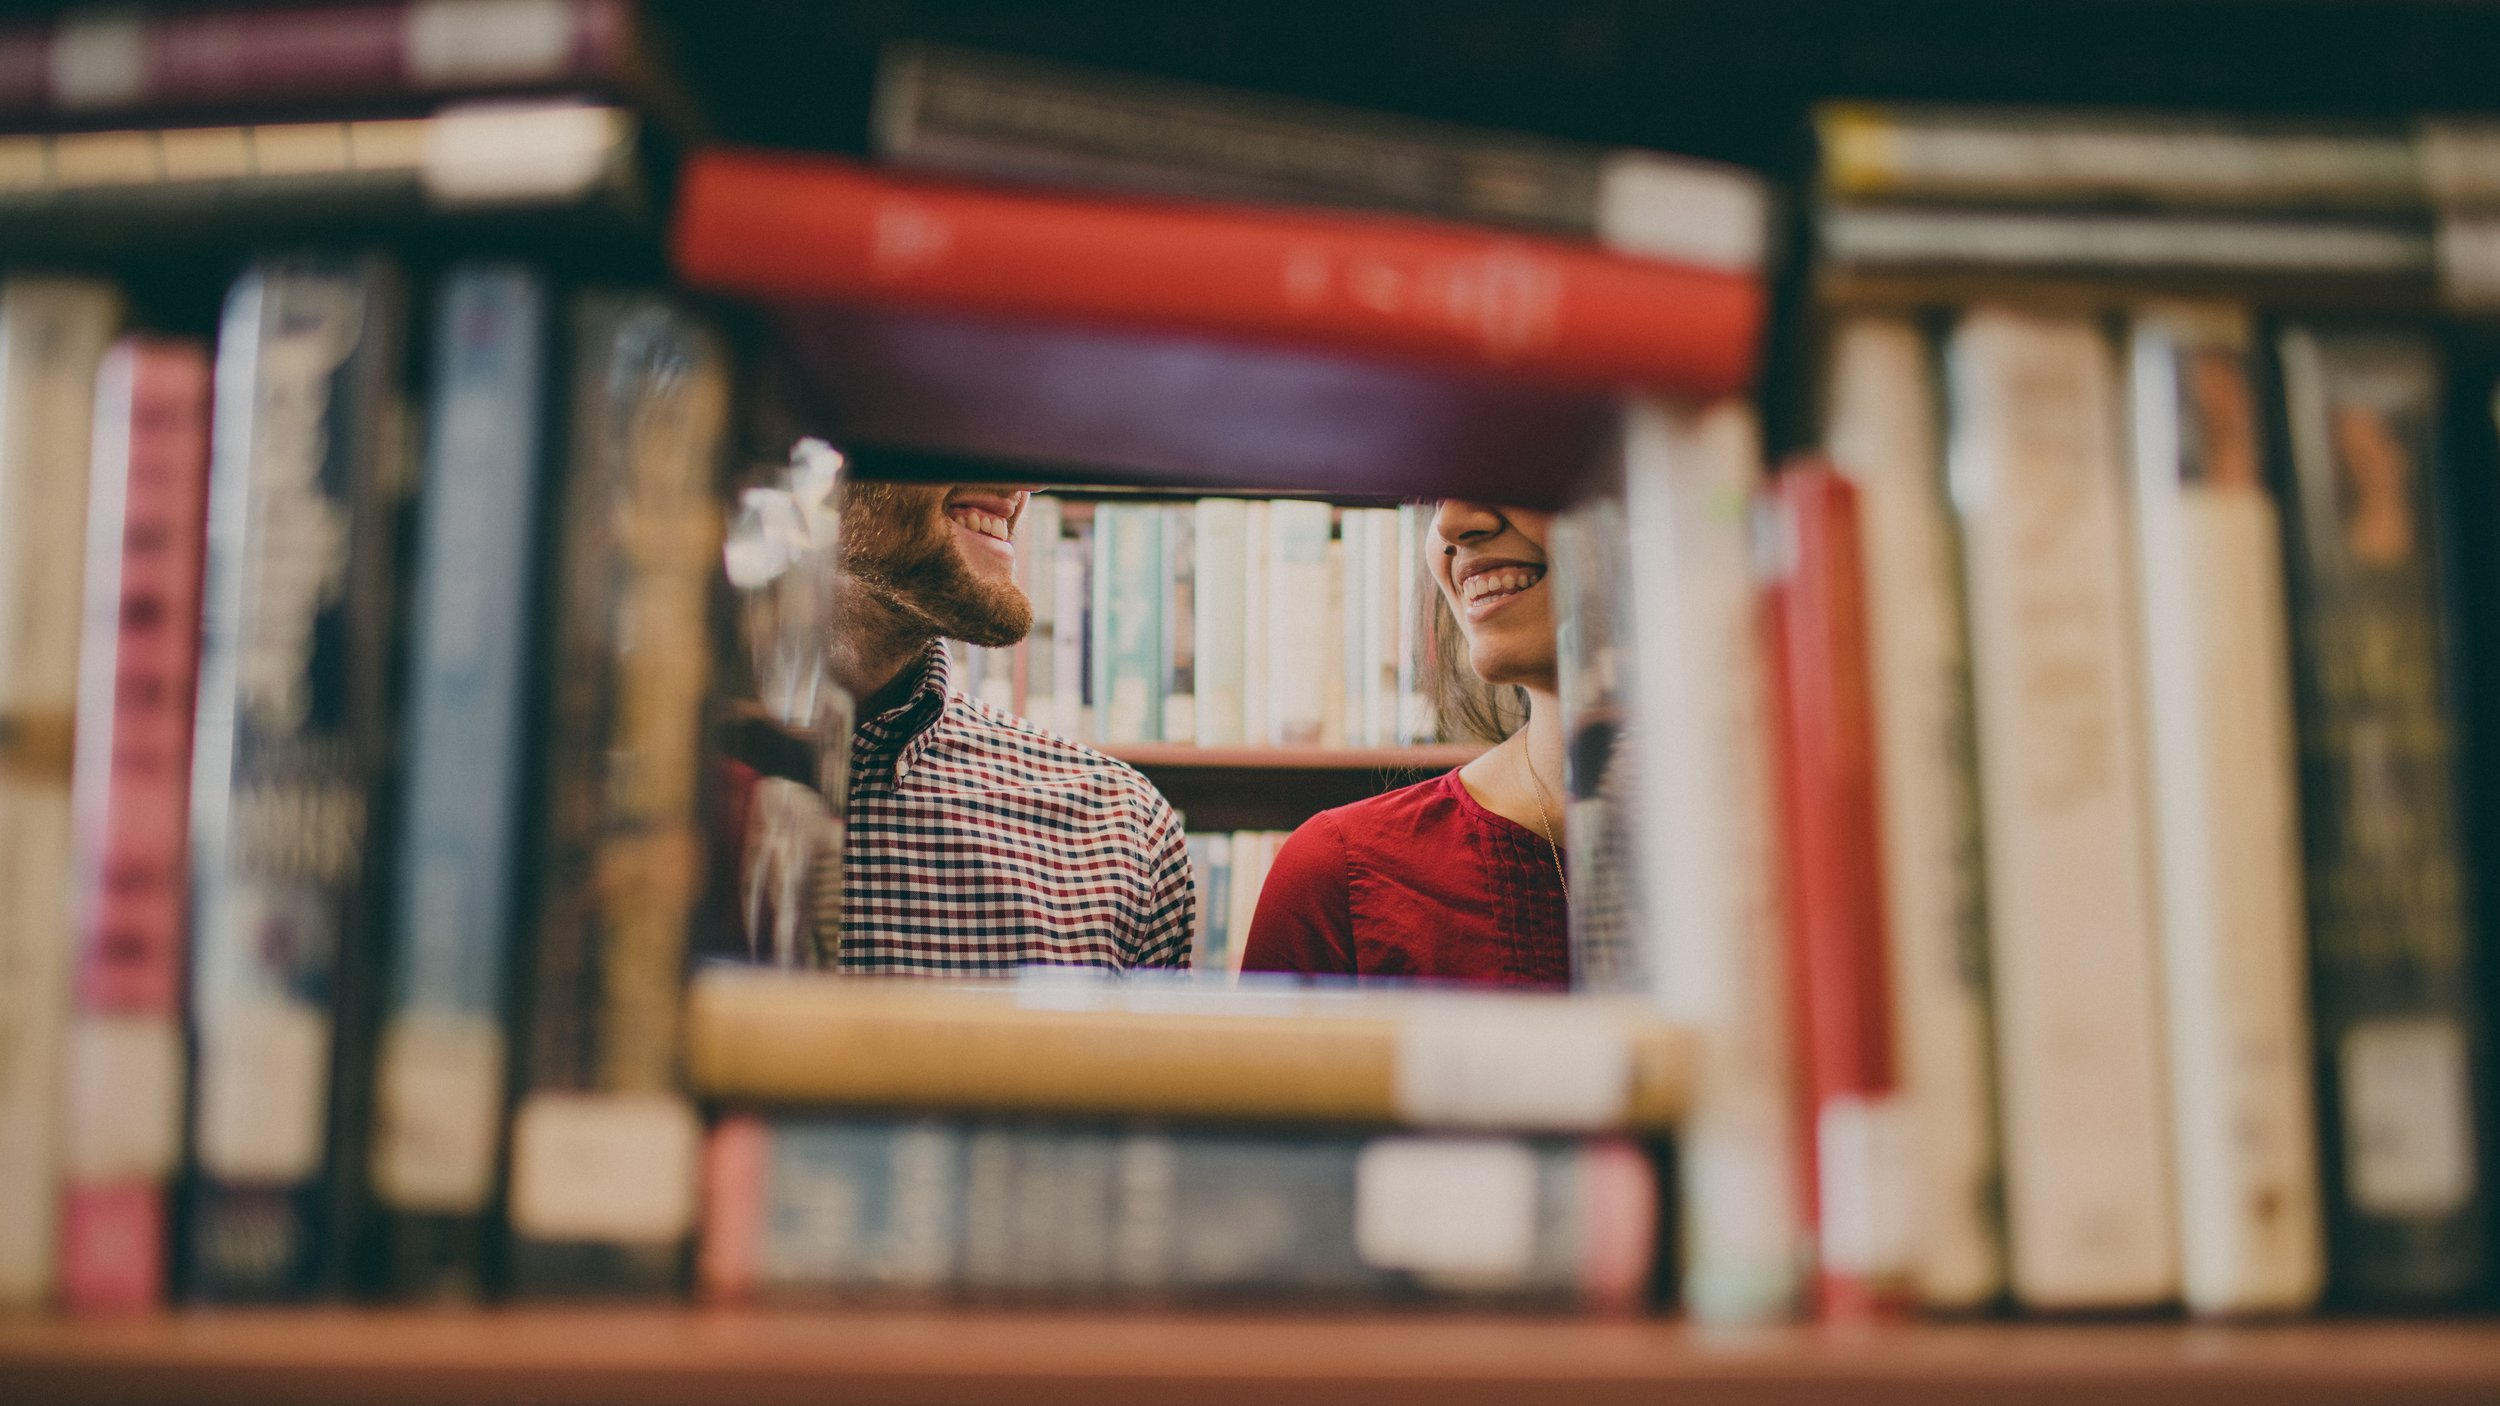 impact-iowa-bookstore-resources-gary-barb-rosberg